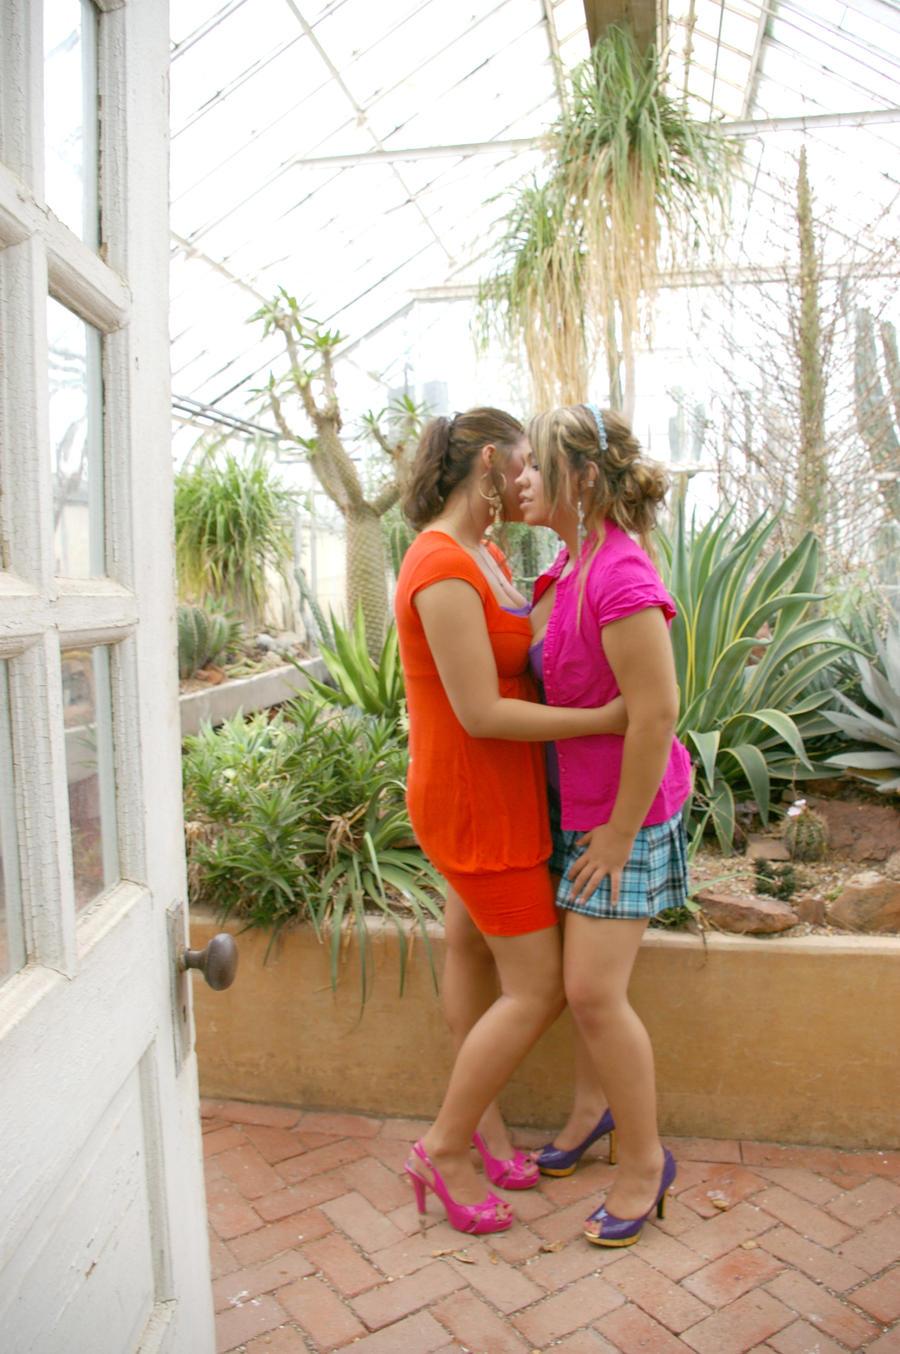 Lesbian Taking in the Garden 3